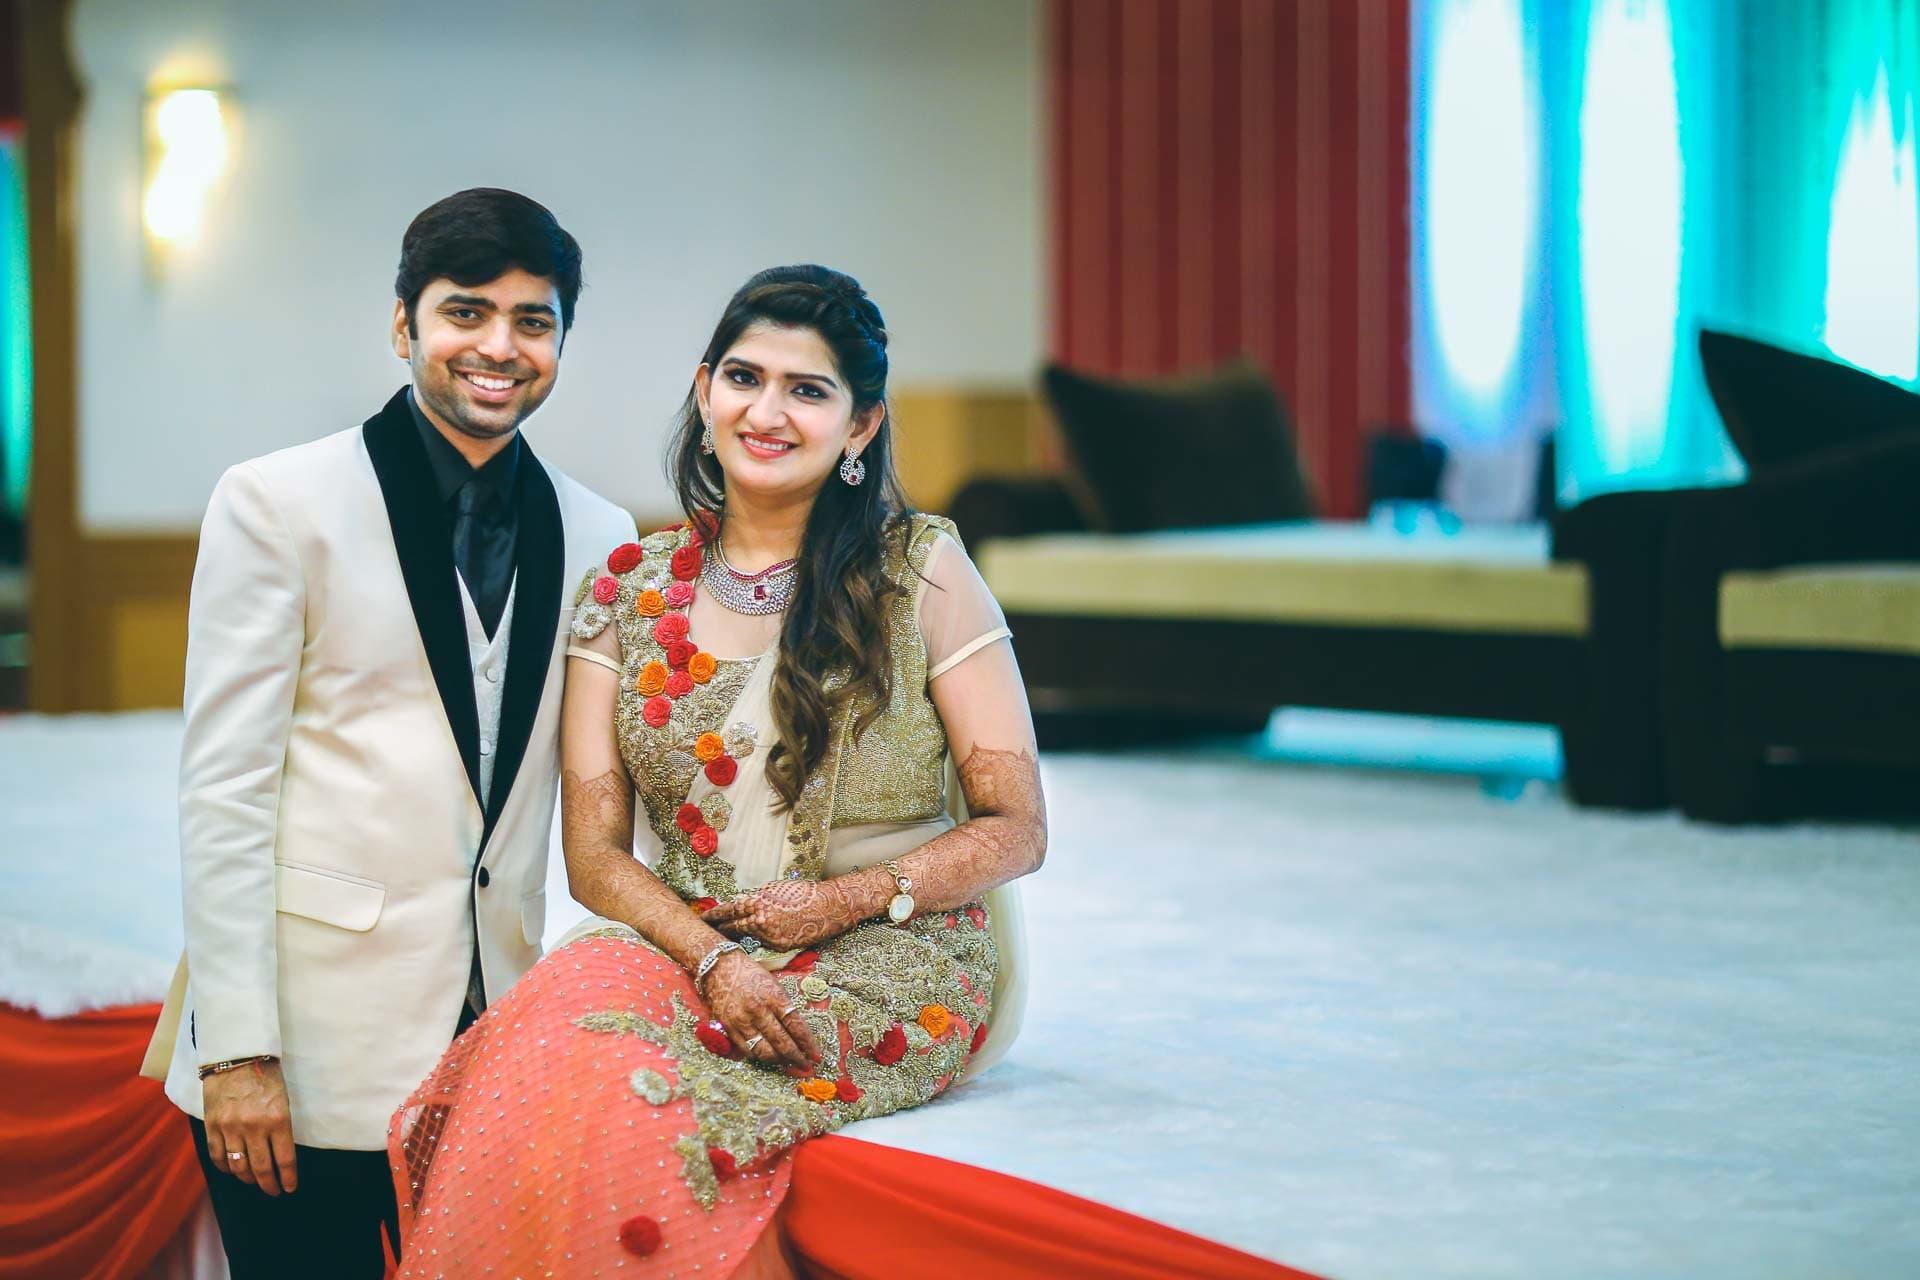 anuj & malvika!:akshay sansare photography and films